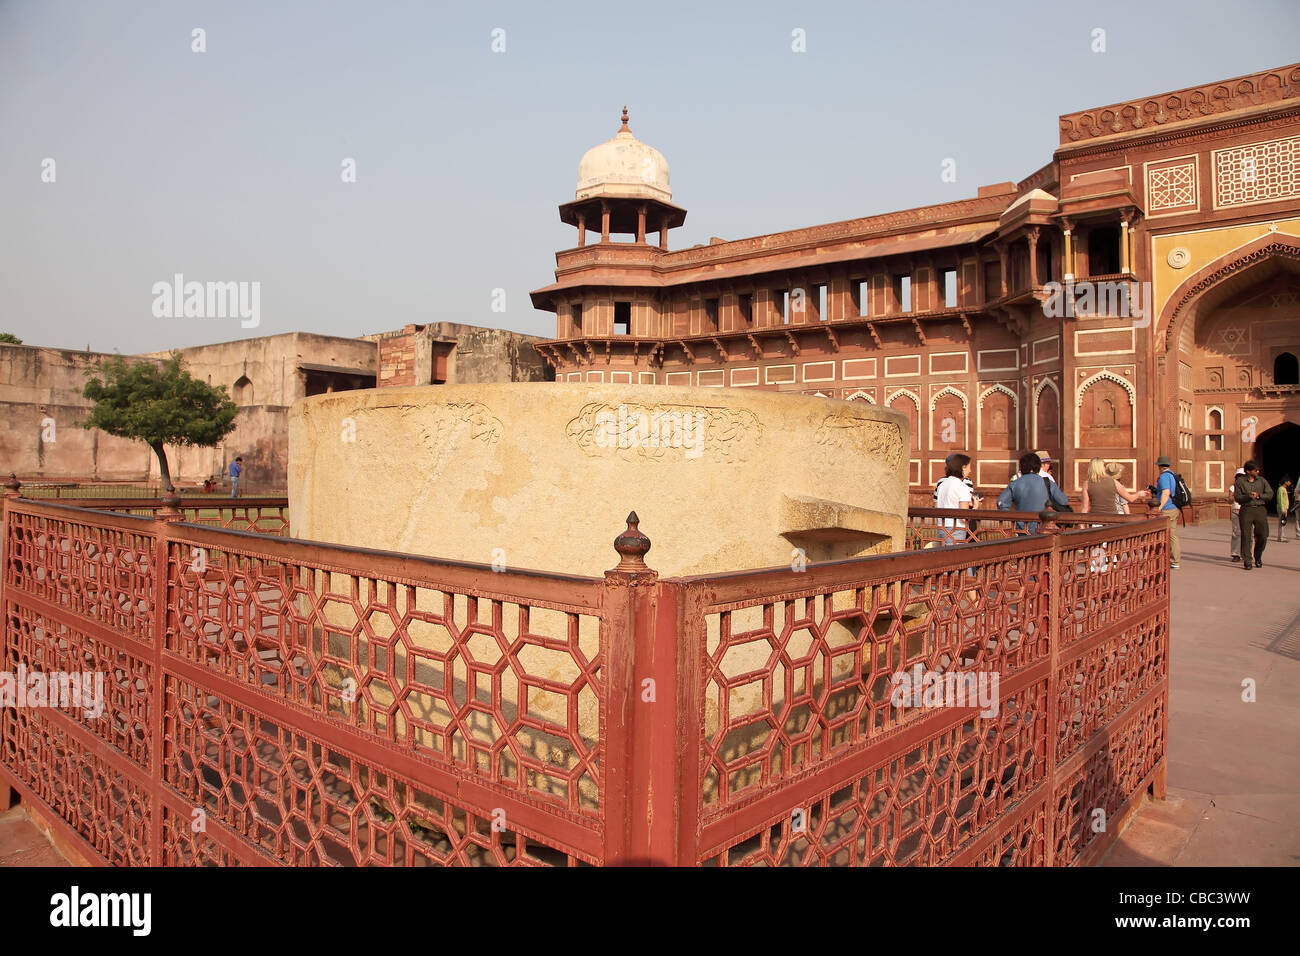 agra fort indo islamic architecture indian architecture tourist